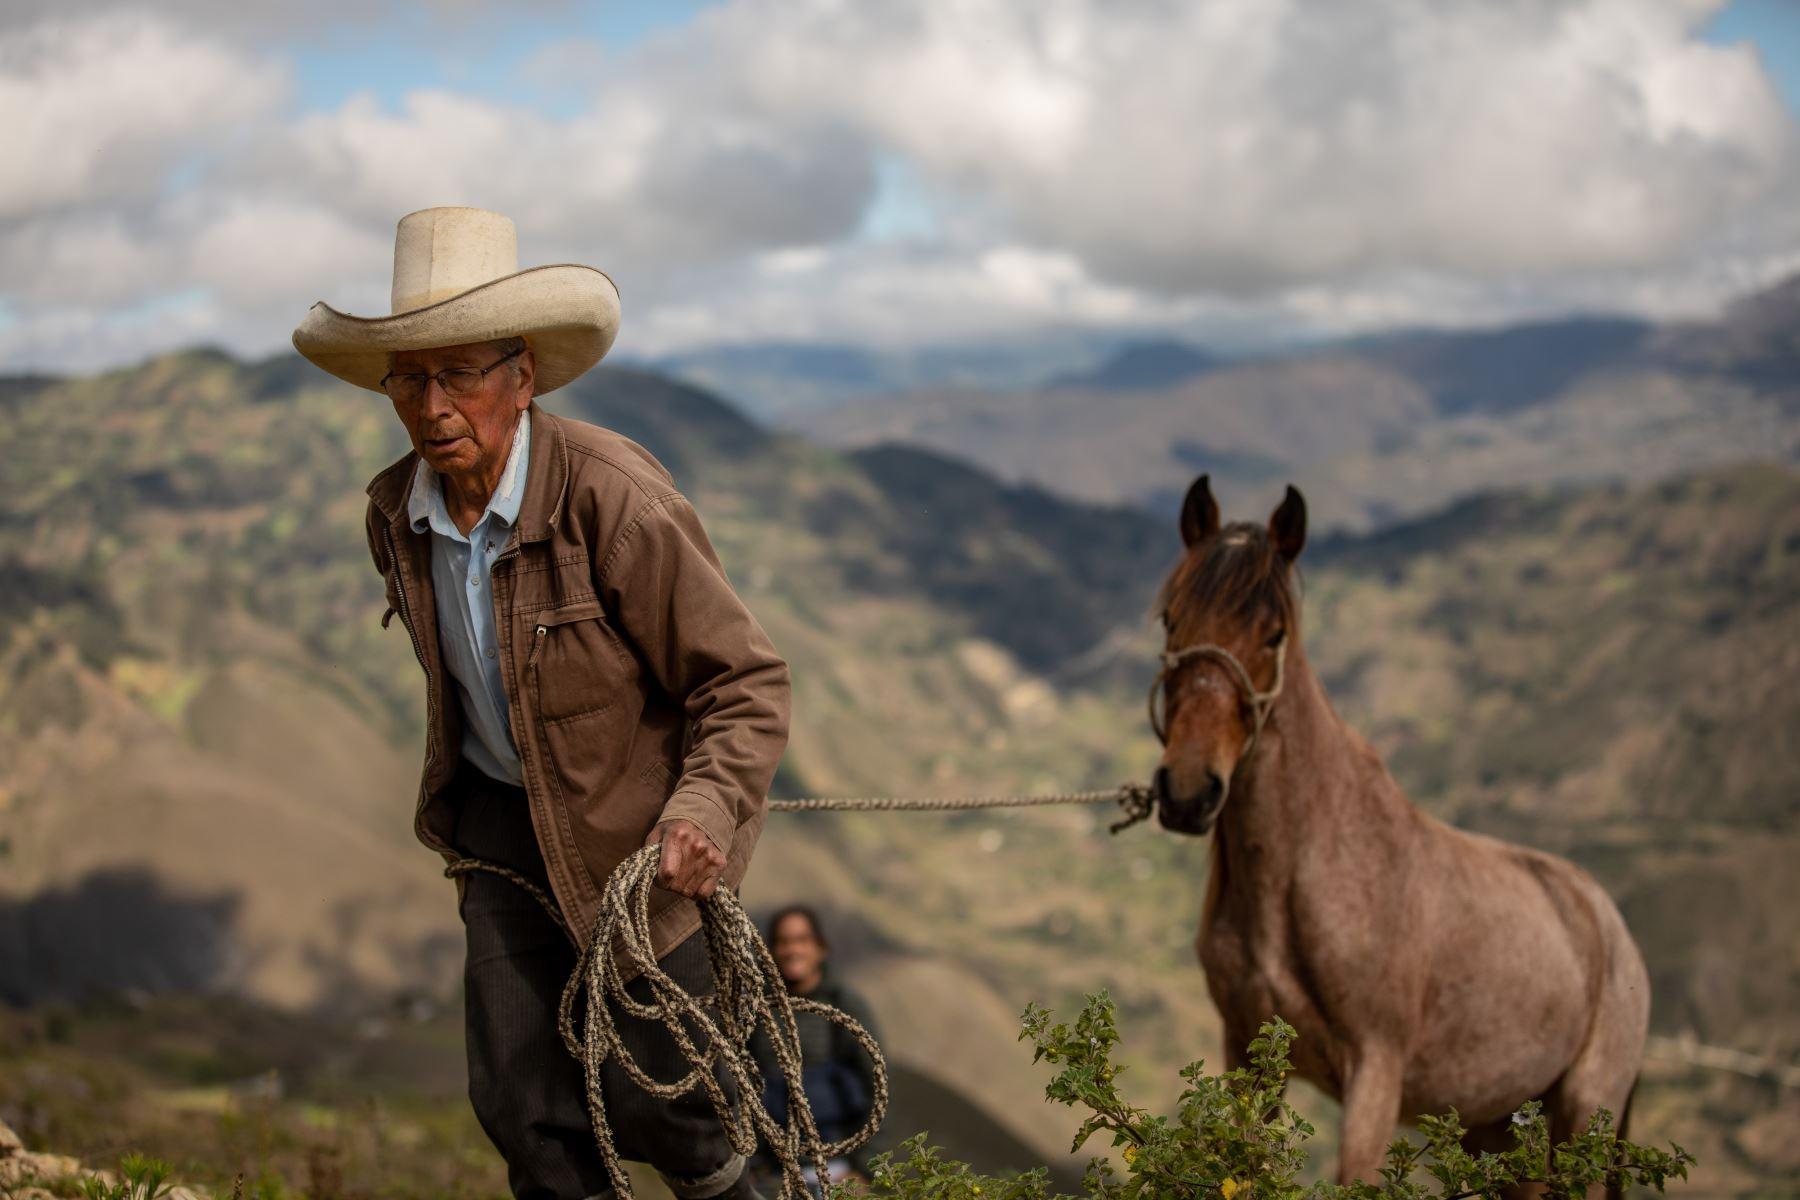 Ireño Castillo Nuñez, padre de Pedro Castillo, realiza su faena diaria. Foto: ANDINA/Andrés Valle